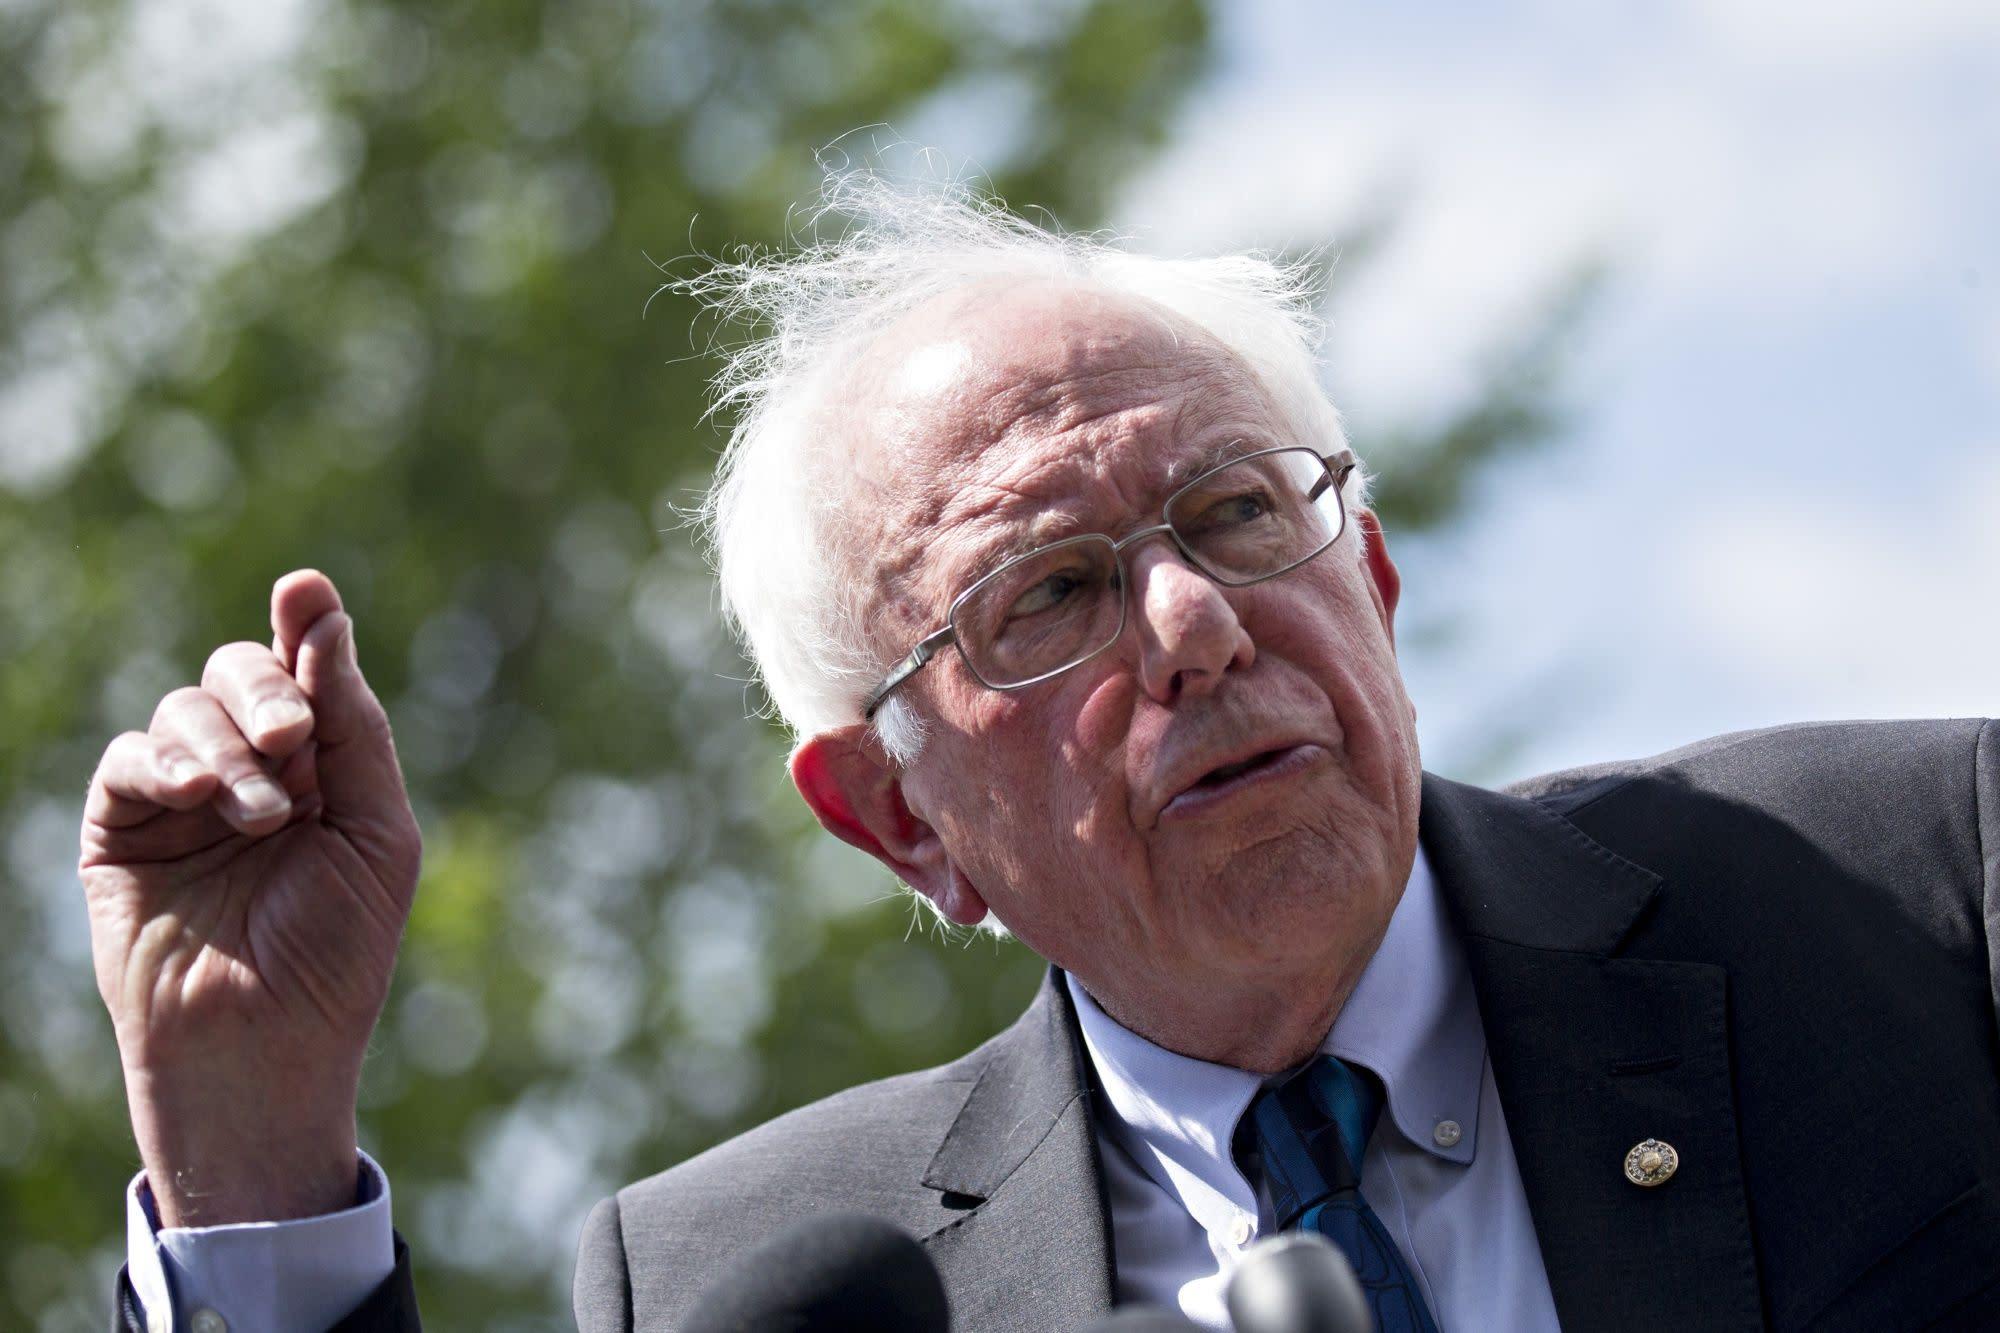 On Cue, Wall Street Challenges Bernie Sanders's Trading Tax Plan